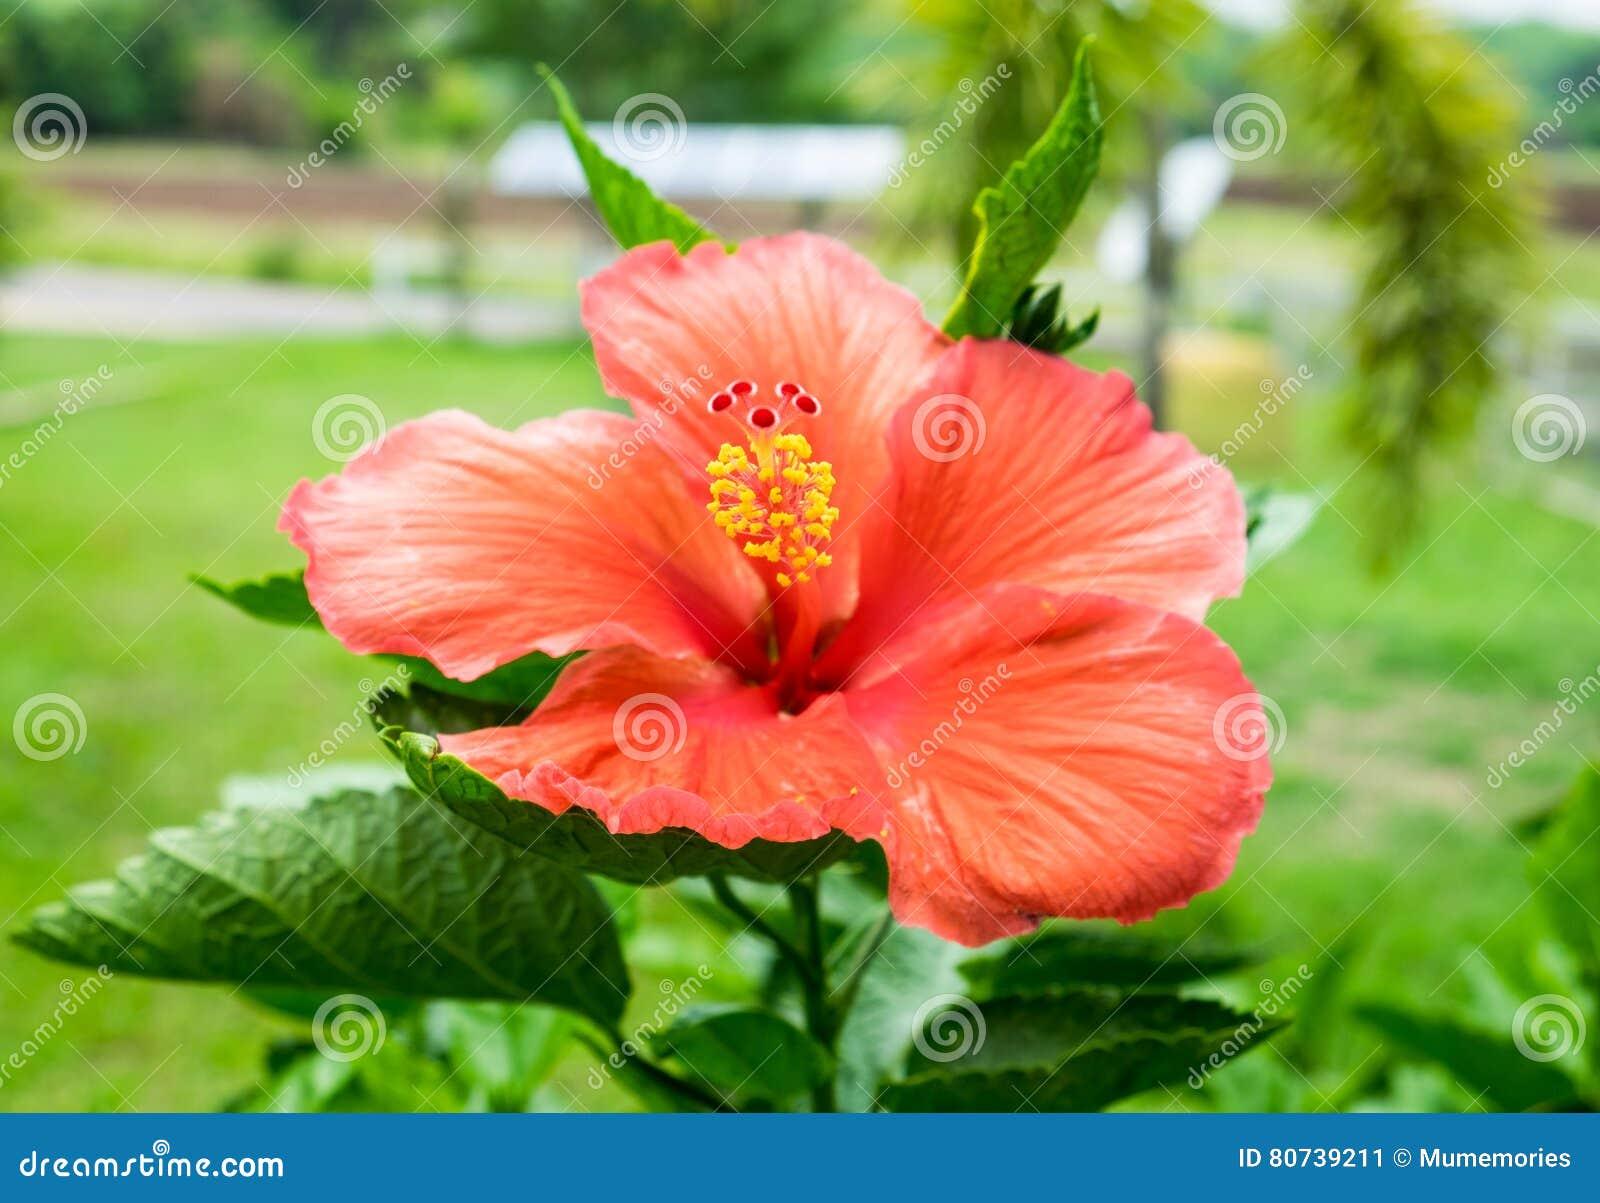 Red Orange Hibiscus China Rose Hawaiian Flower Blossom Colorful